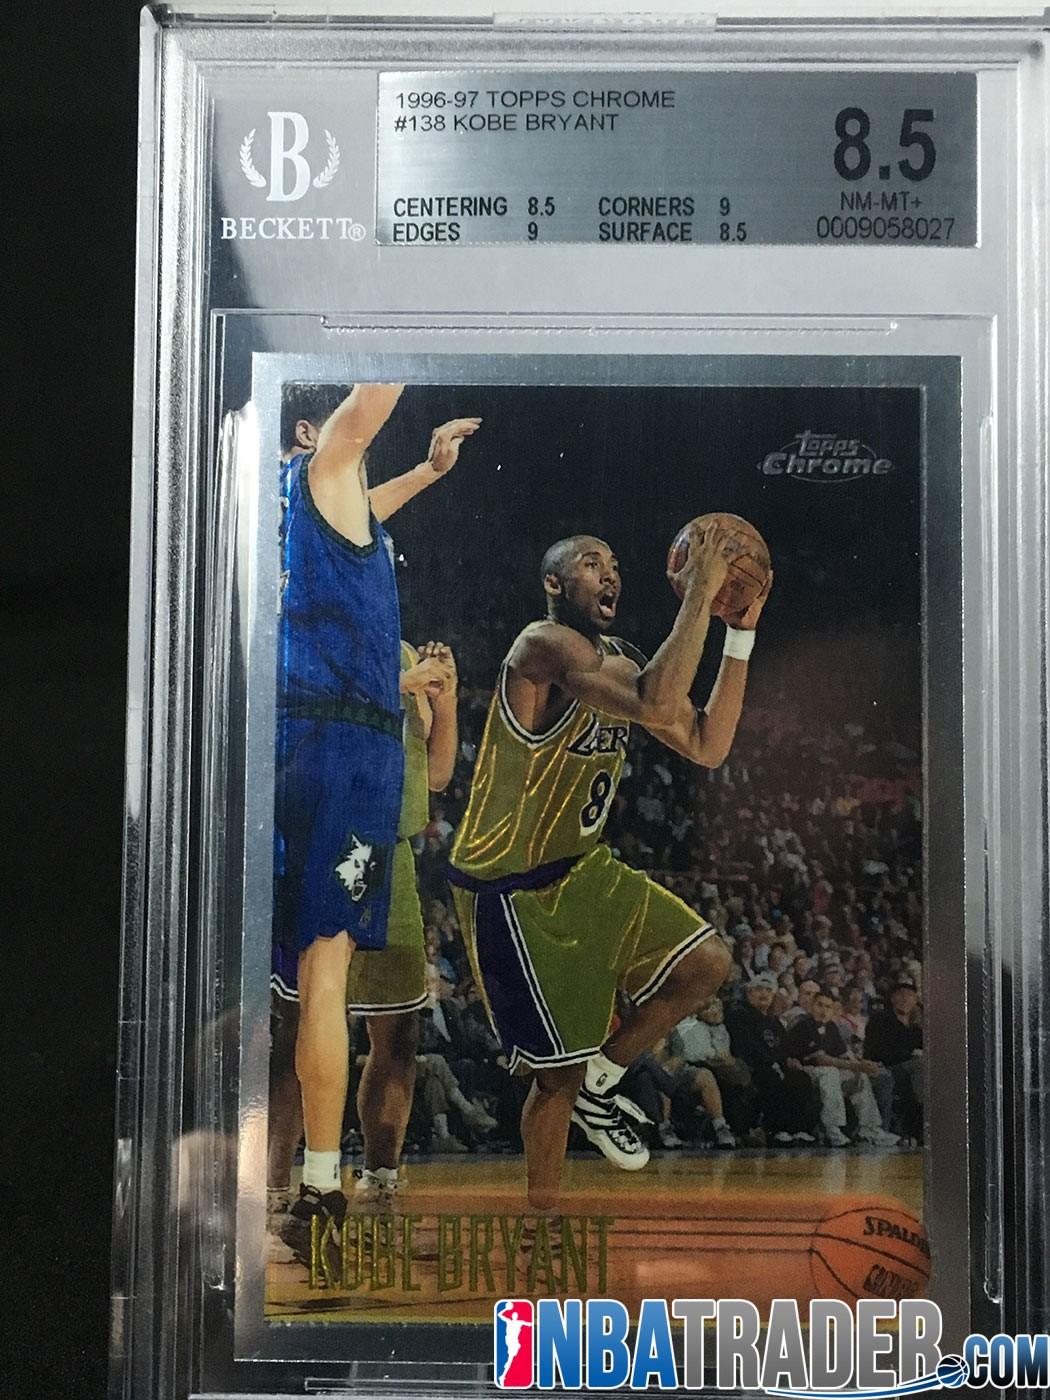 Kobe Bryant 1996 Chrome Rookie Rc Graded Bgs 85 Nba Trader